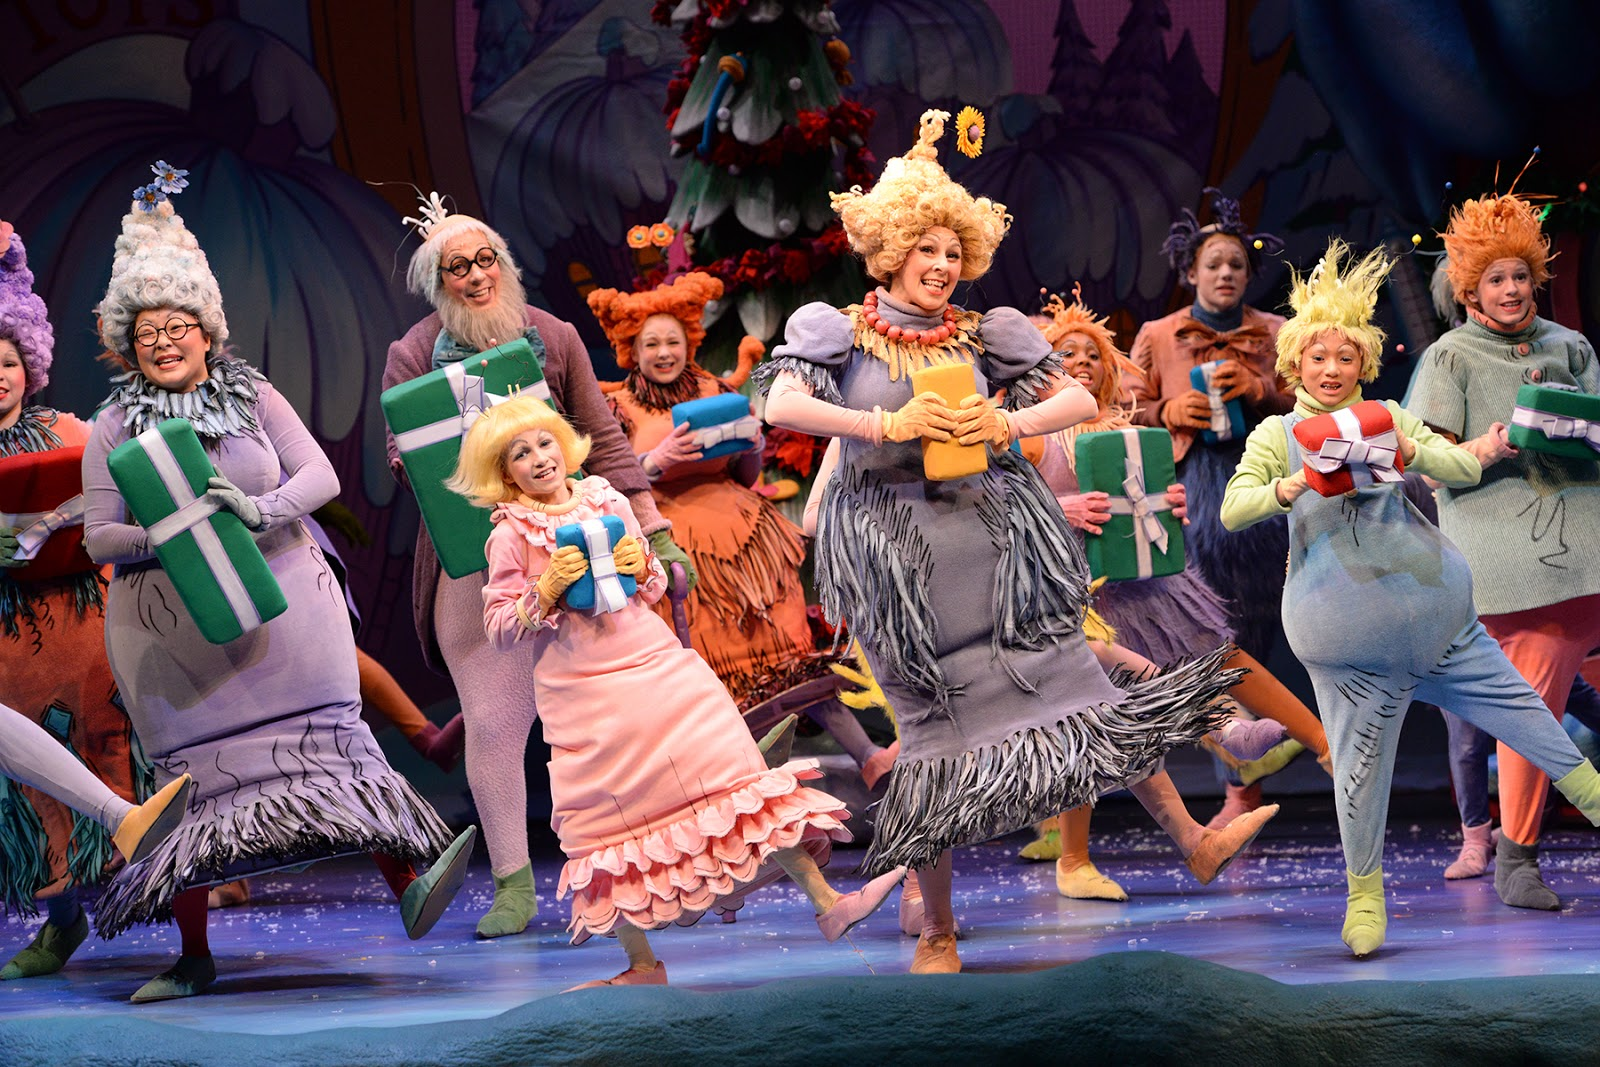 photo by kaitlin randolph - Cast Of How The Grinch Stole Christmas